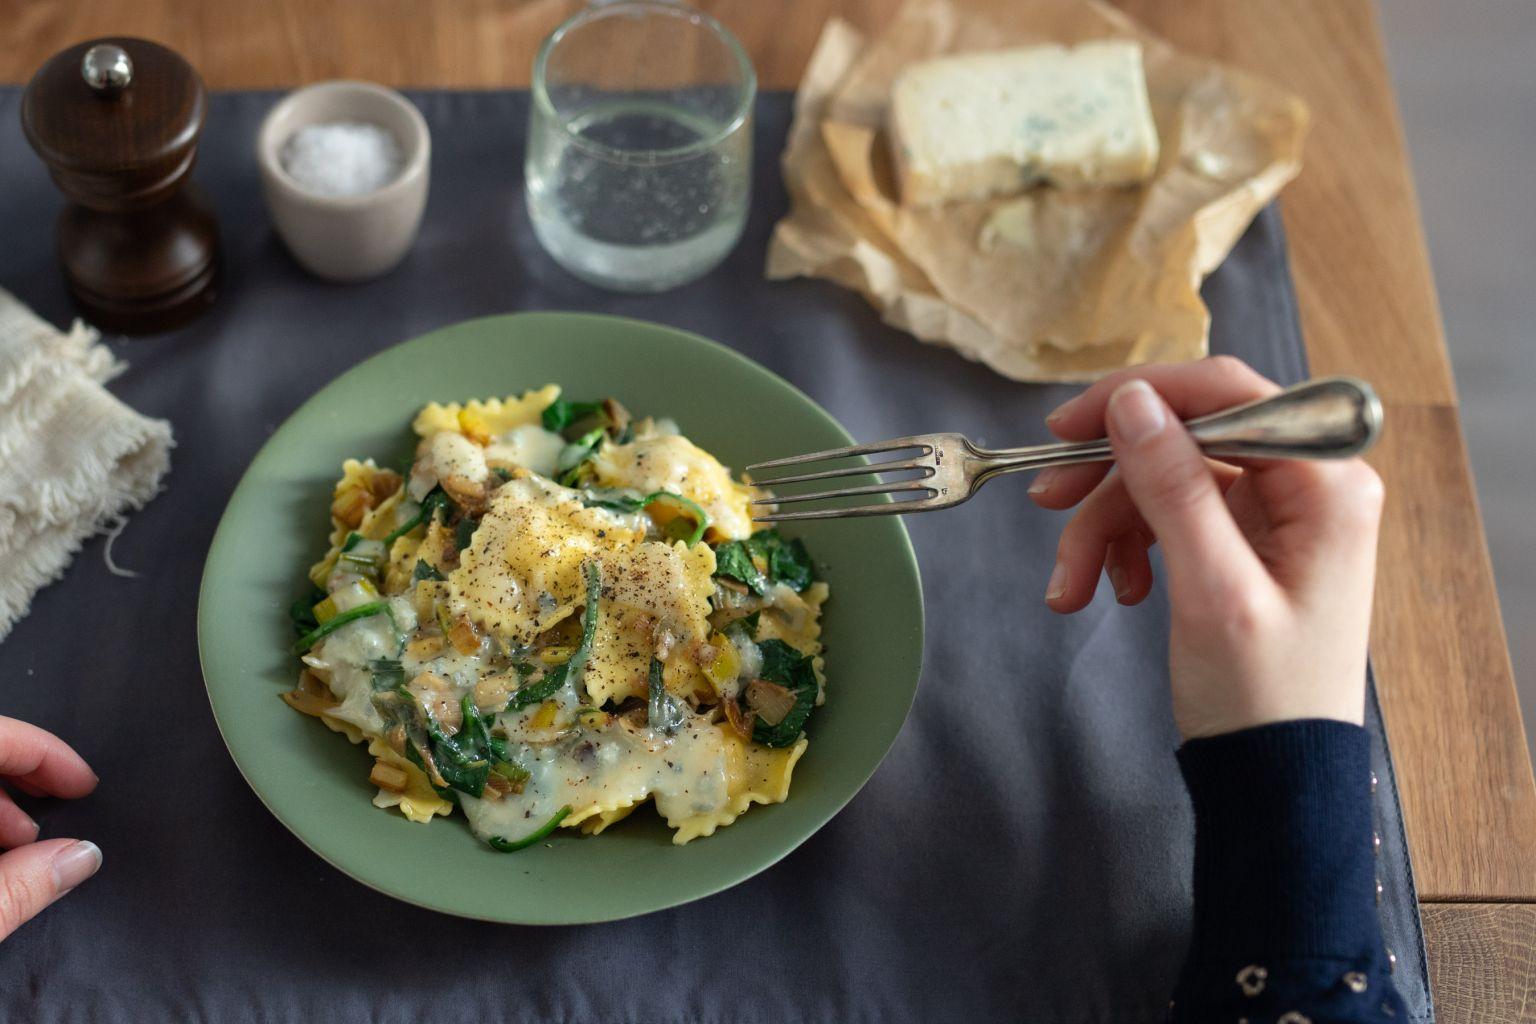 Ravioli farcis aux girolles persillées et gorgonzola